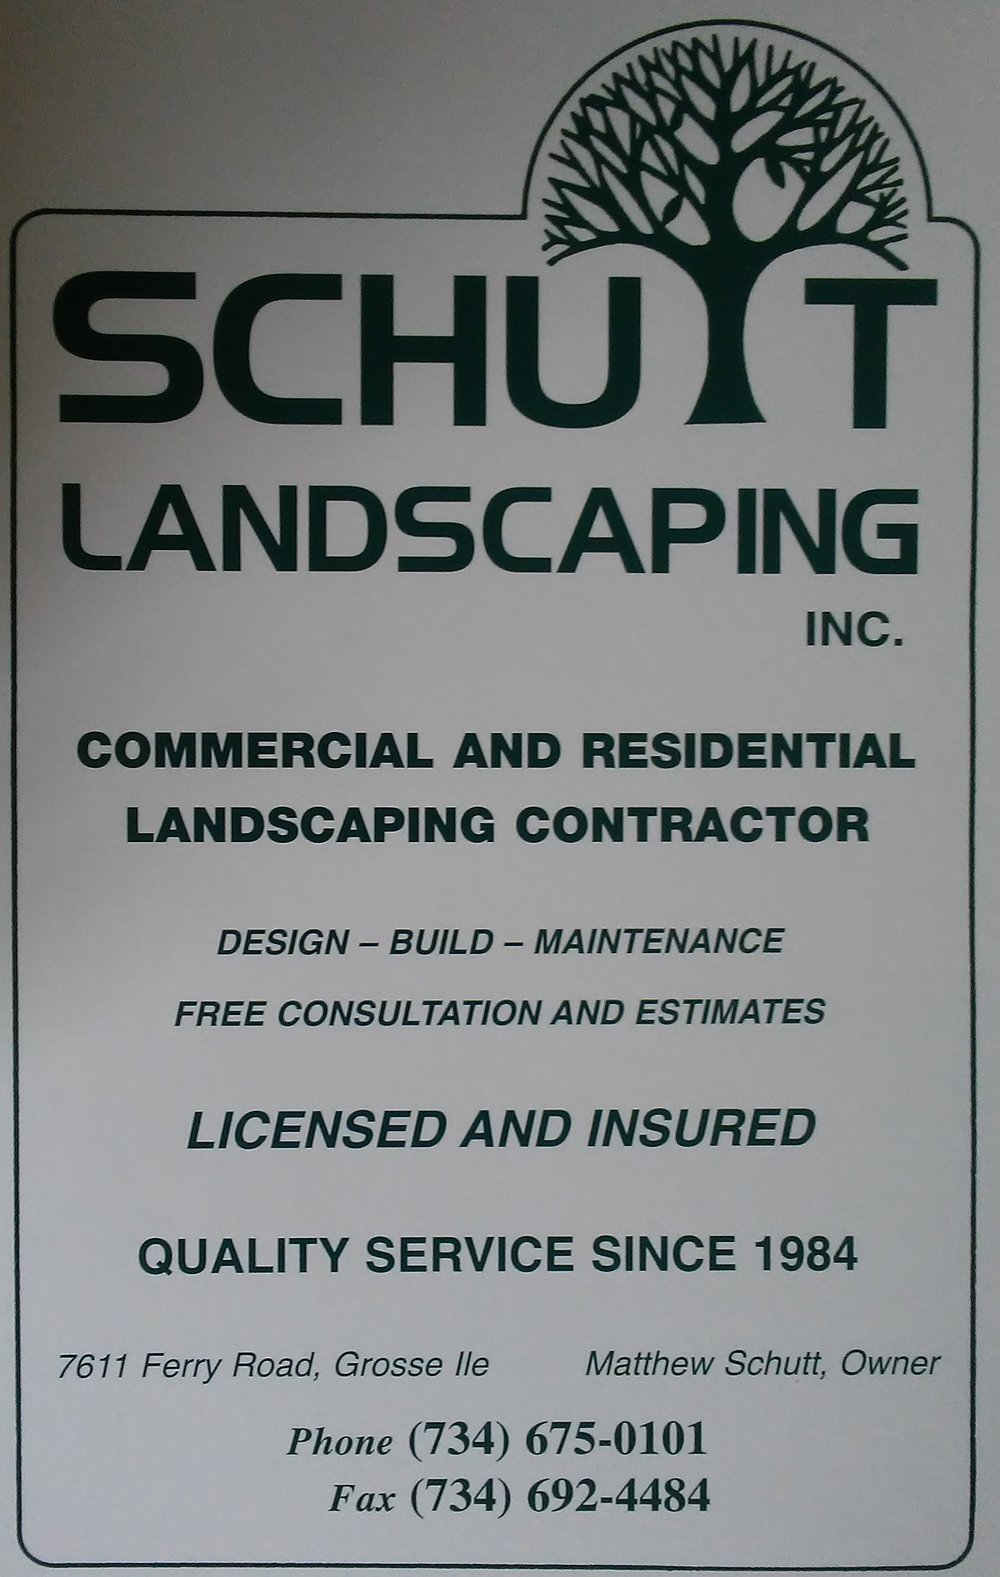 Schutt Landscaping.jpg